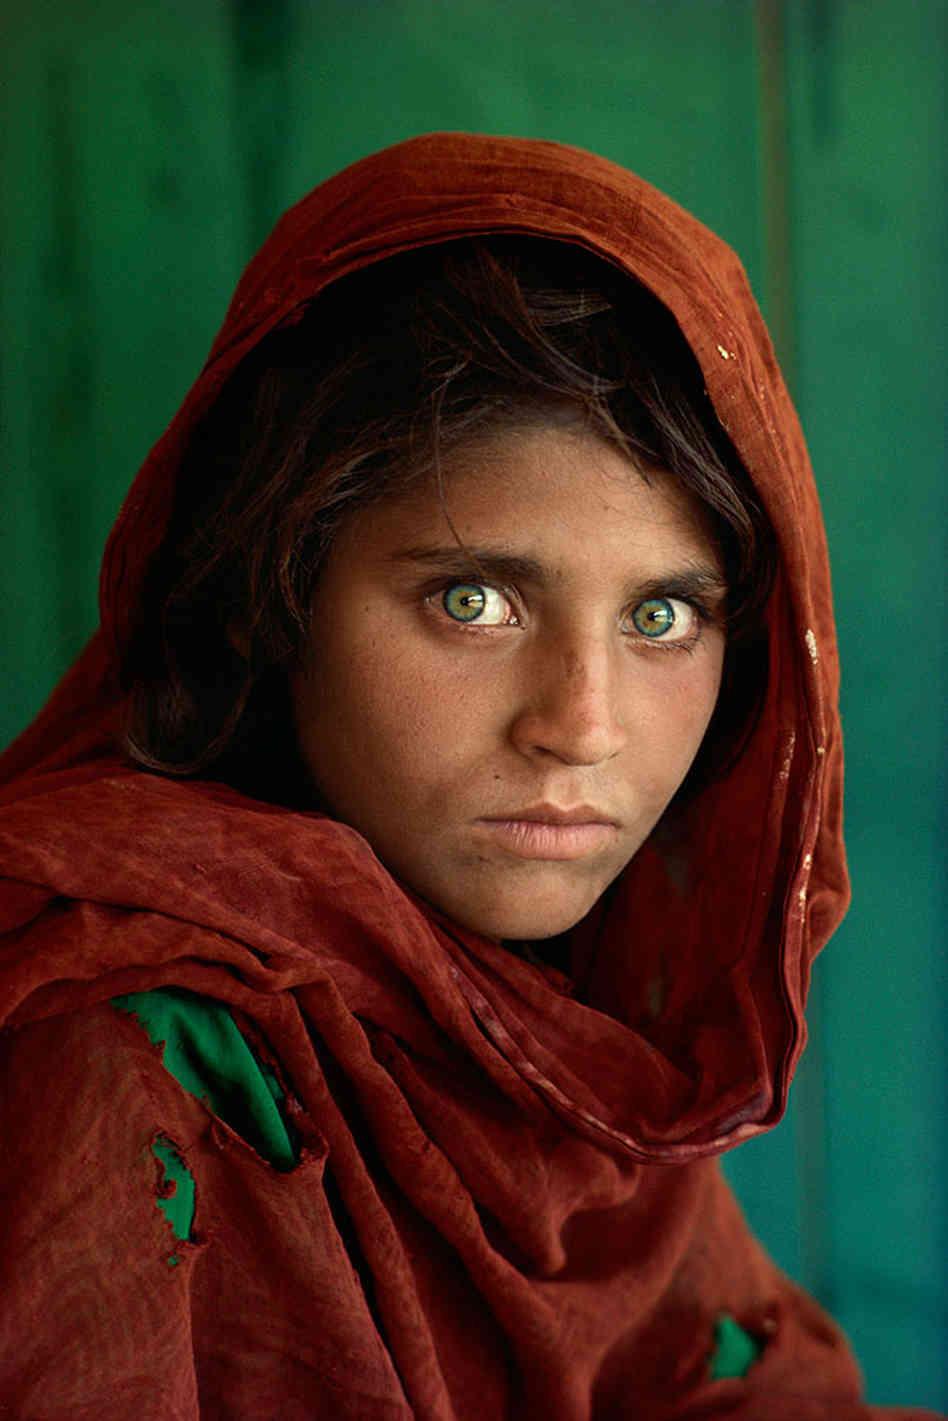 Afghan Girl Nikon Cameraplex